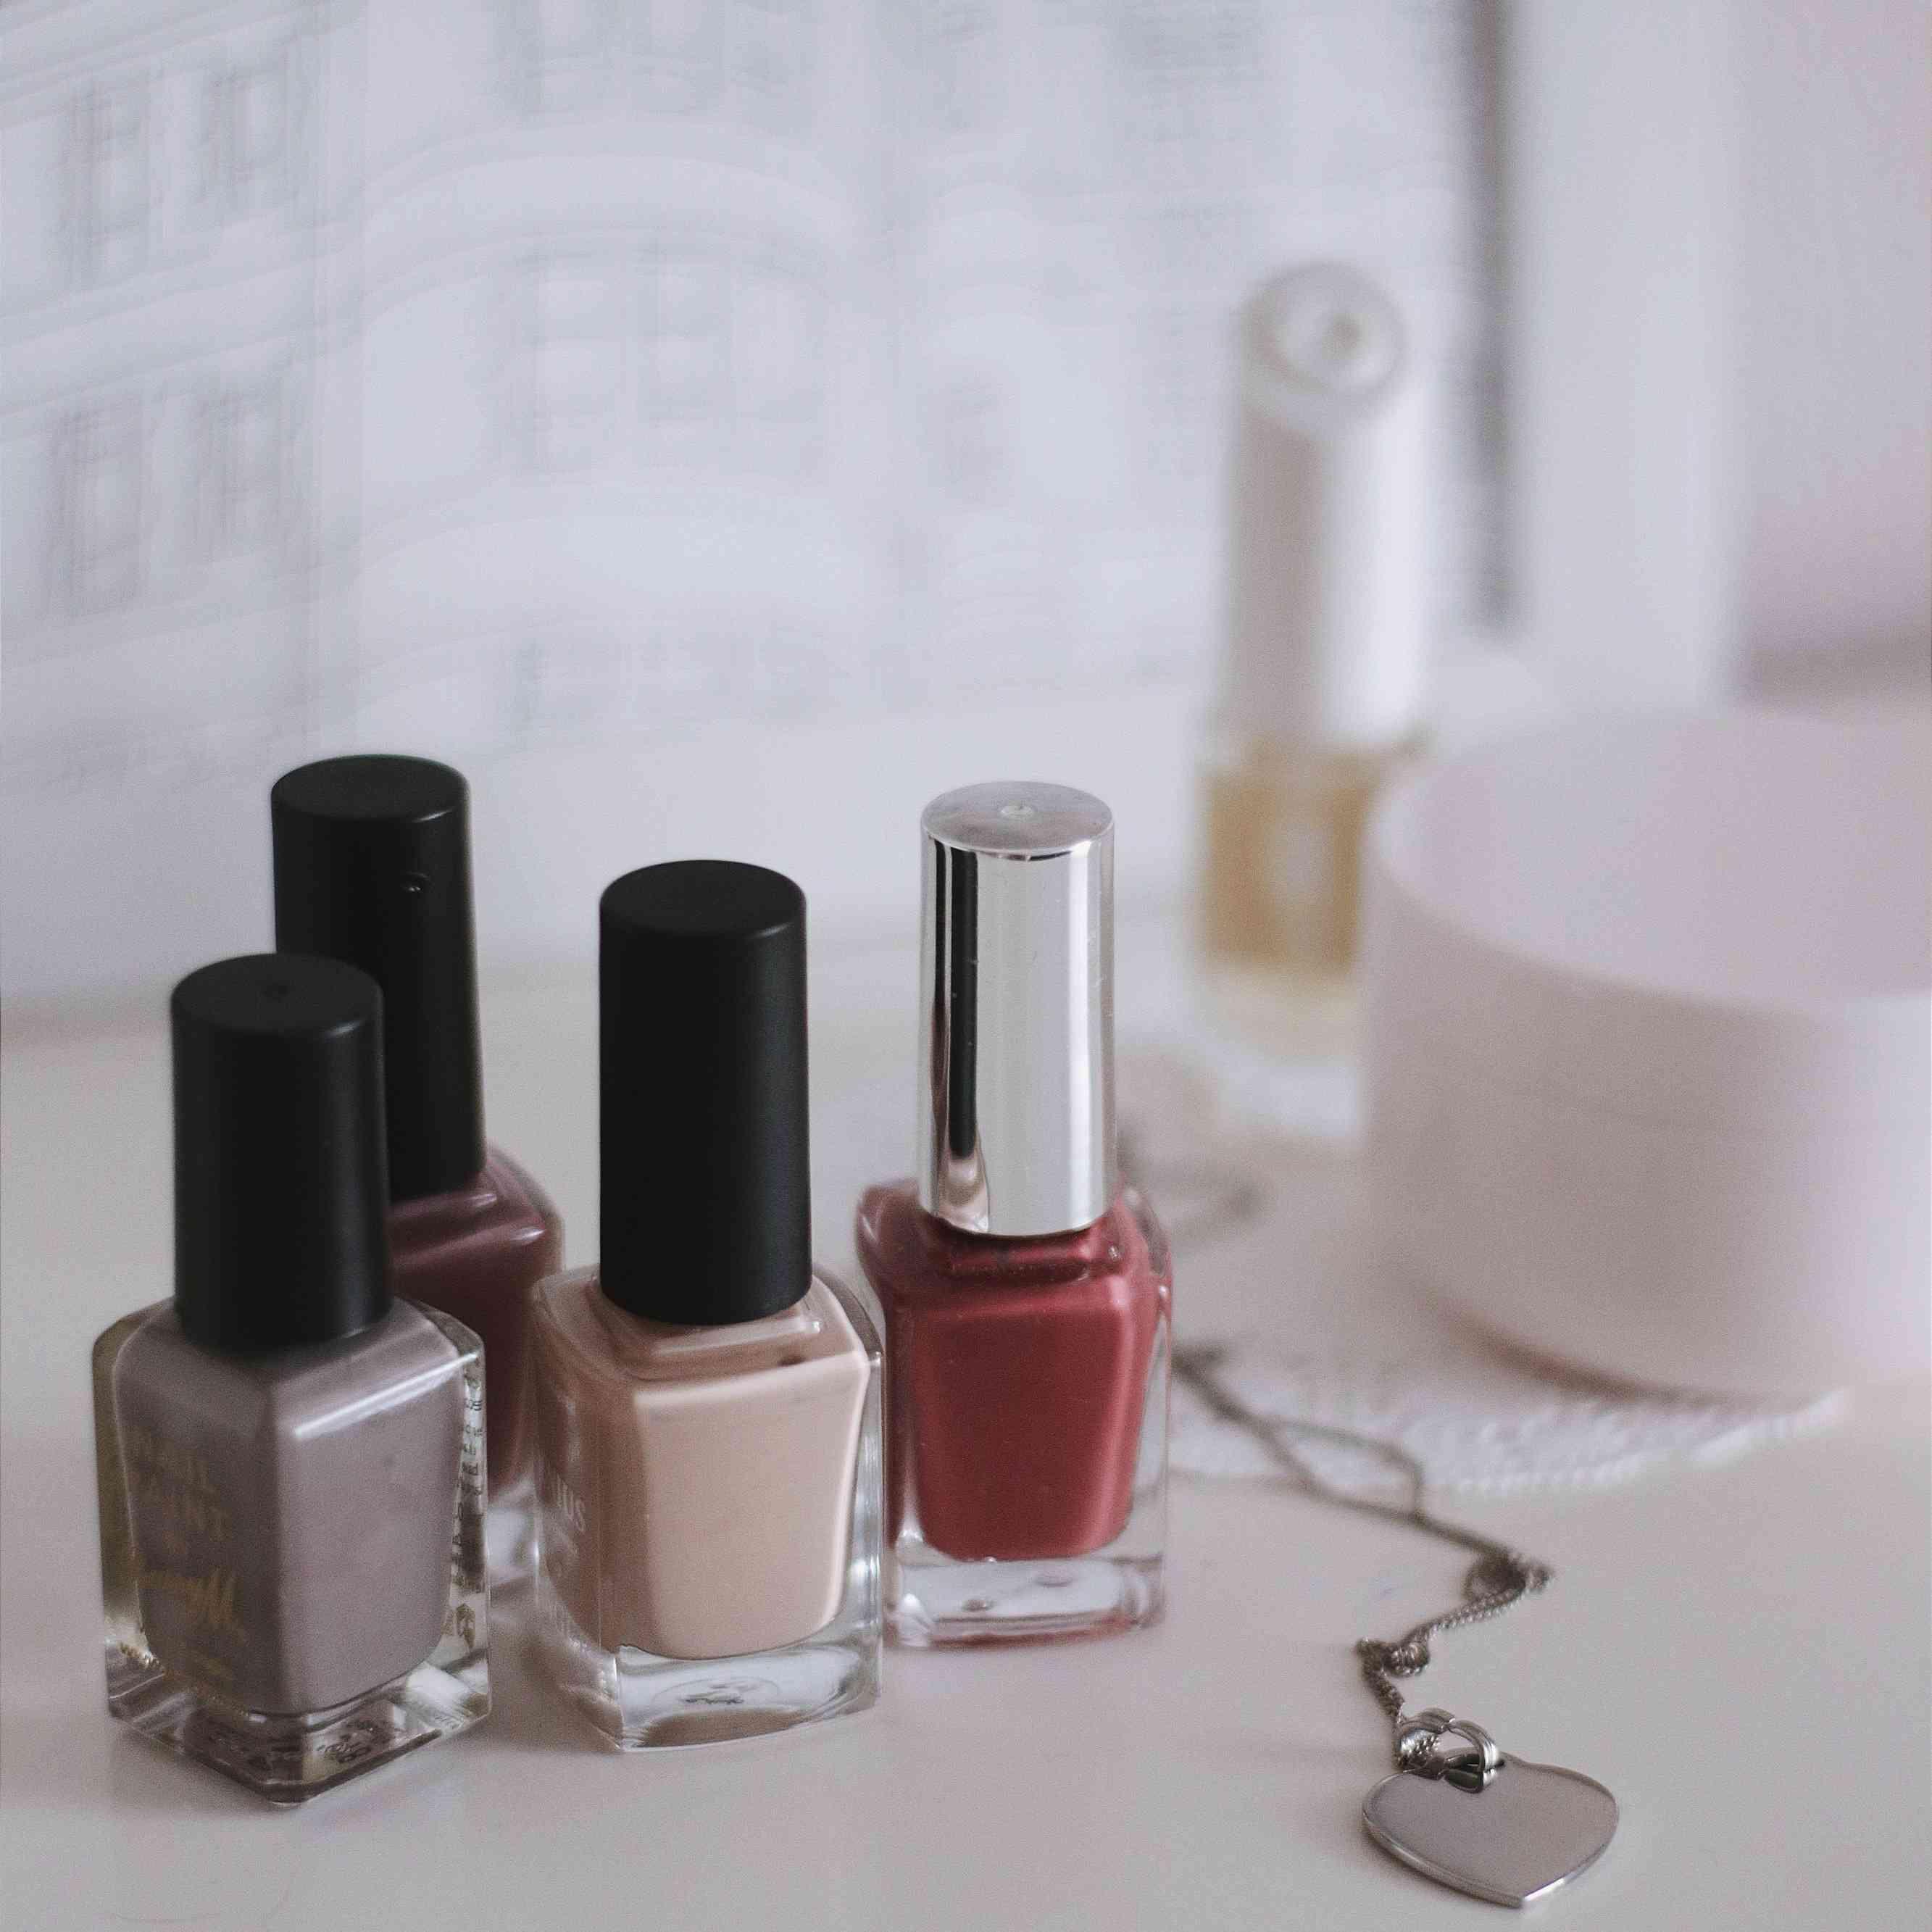 nail polish bottles on a table